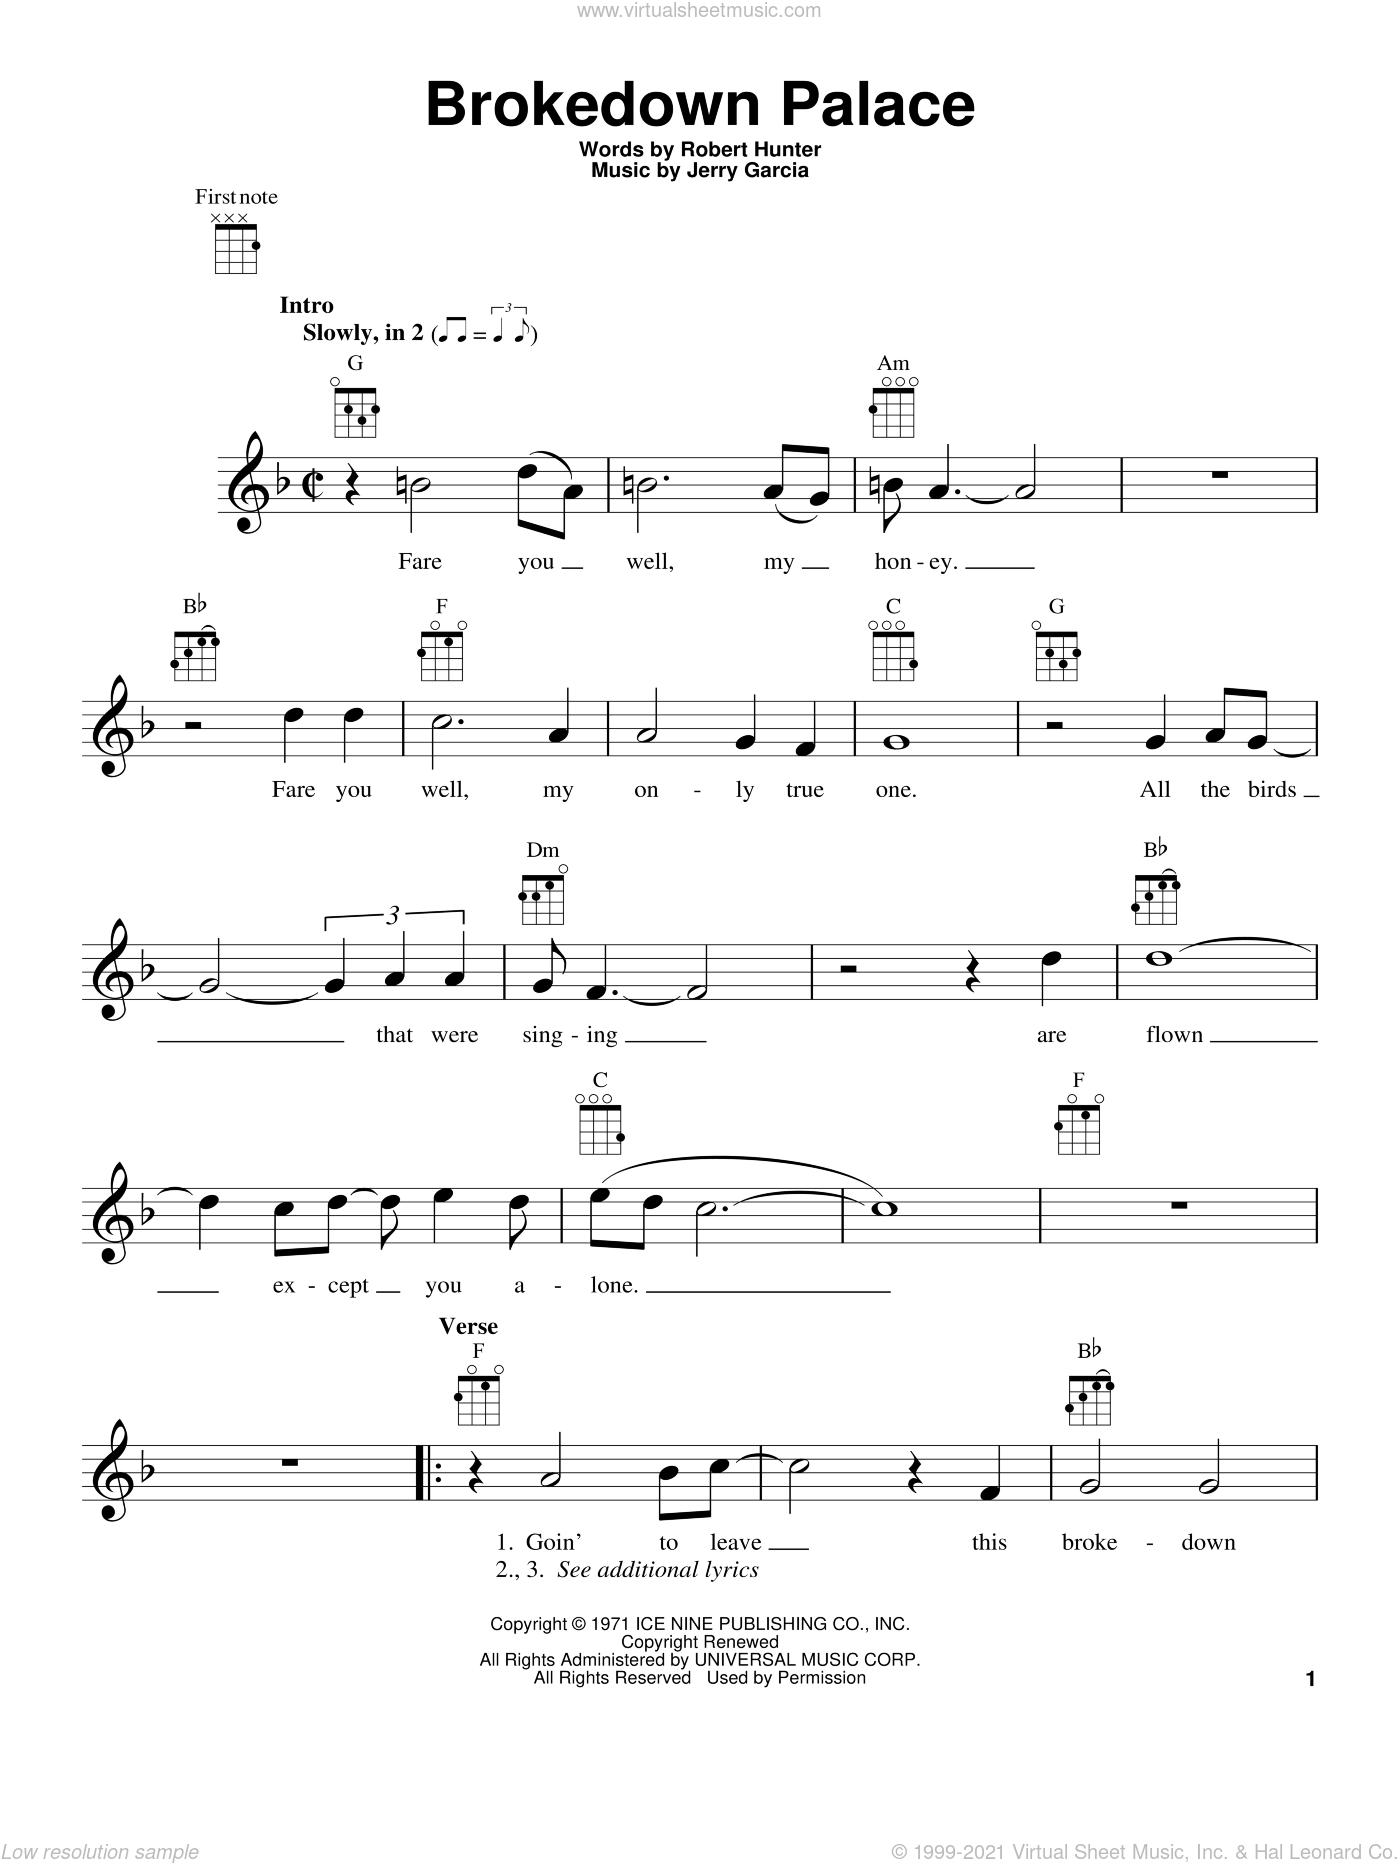 Brokedown Palace sheet music for ukulele by Grateful Dead, Jerry Garcia and Robert Hunter, intermediate skill level